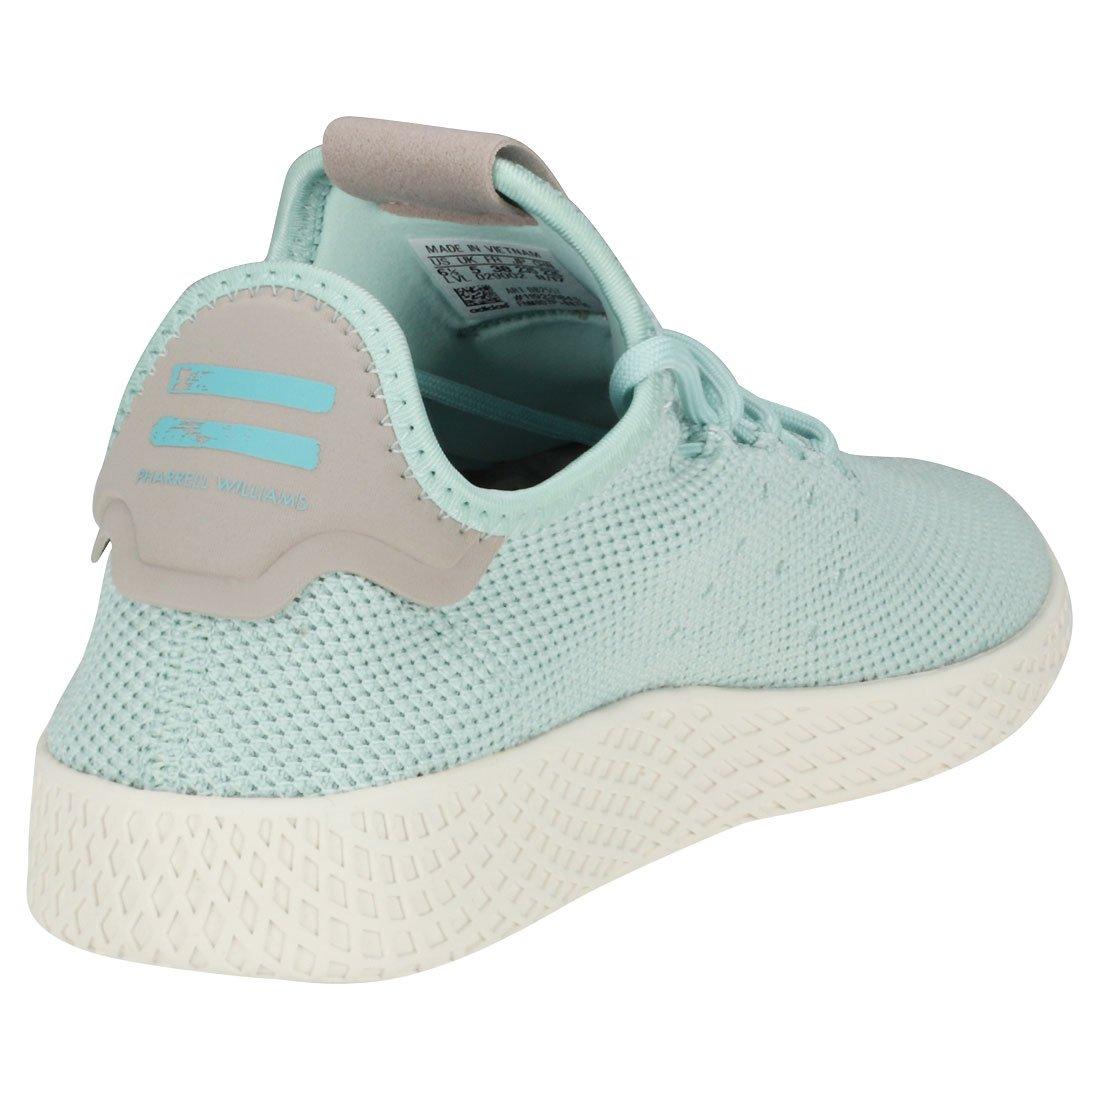 Hu Adidas Tennis Turquoise W Pw Chaussures z4rnxf4